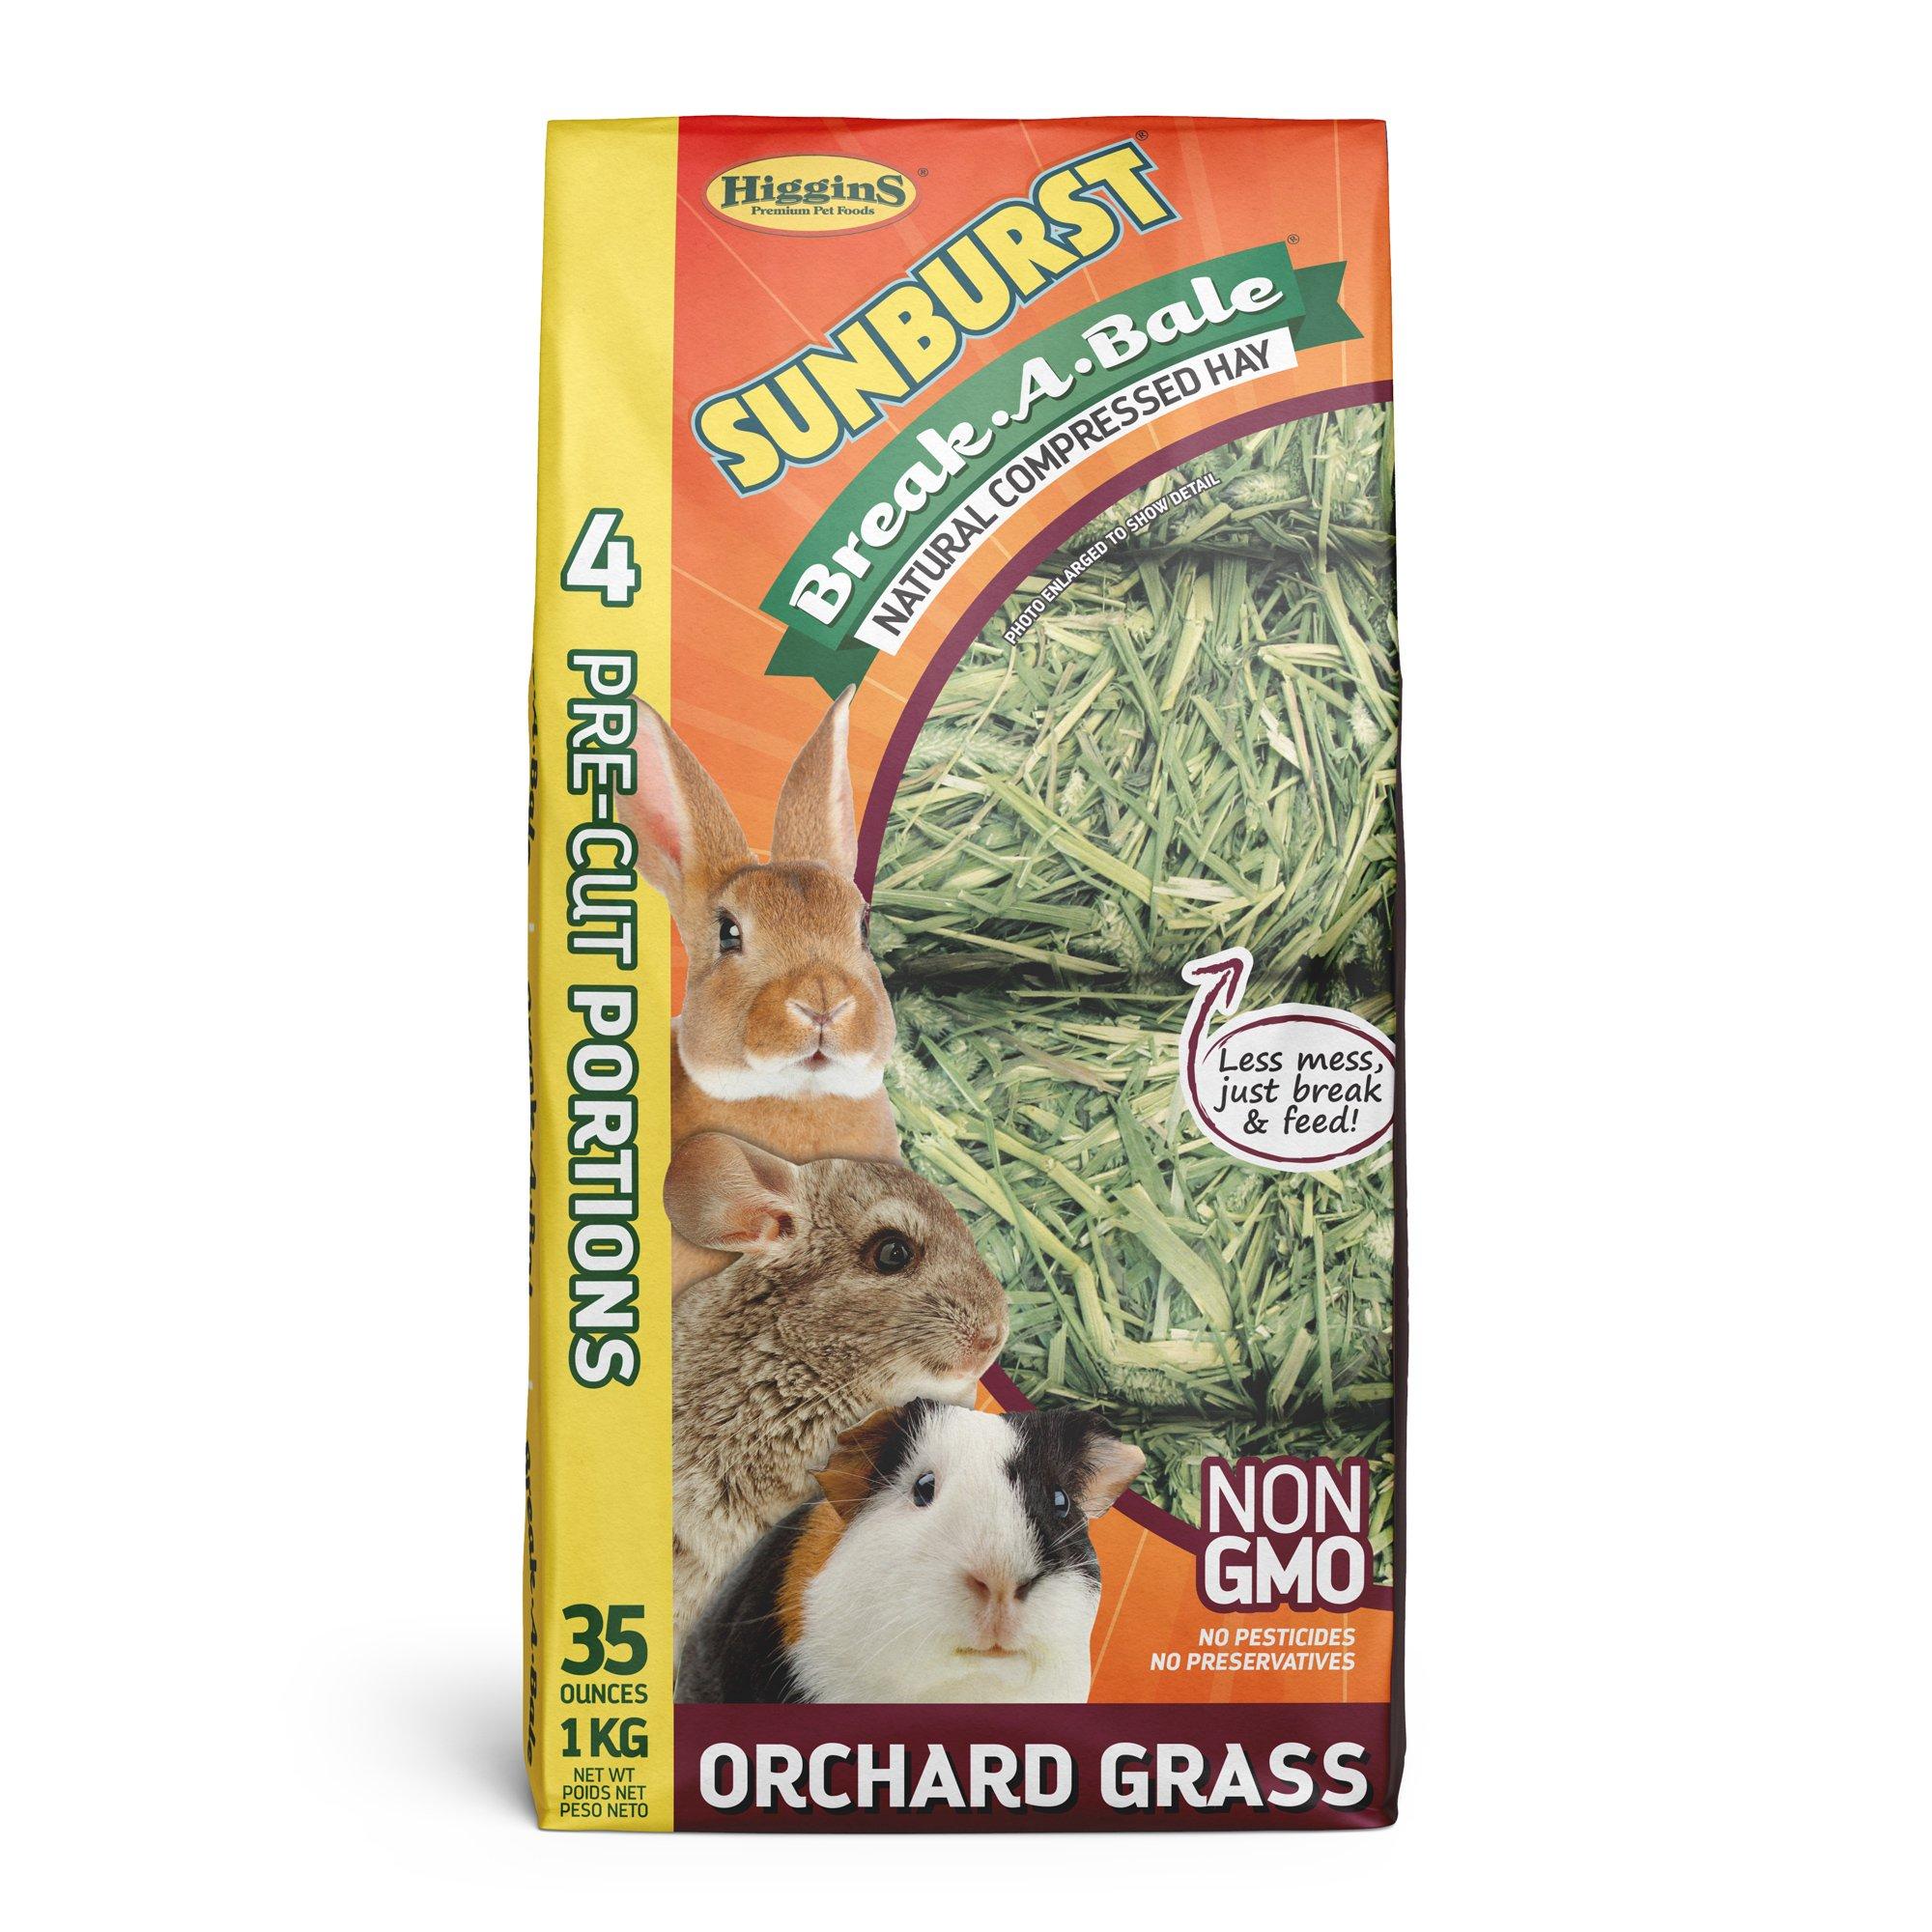 Higgins Sunburst Break-A-Bale Orchard Grass